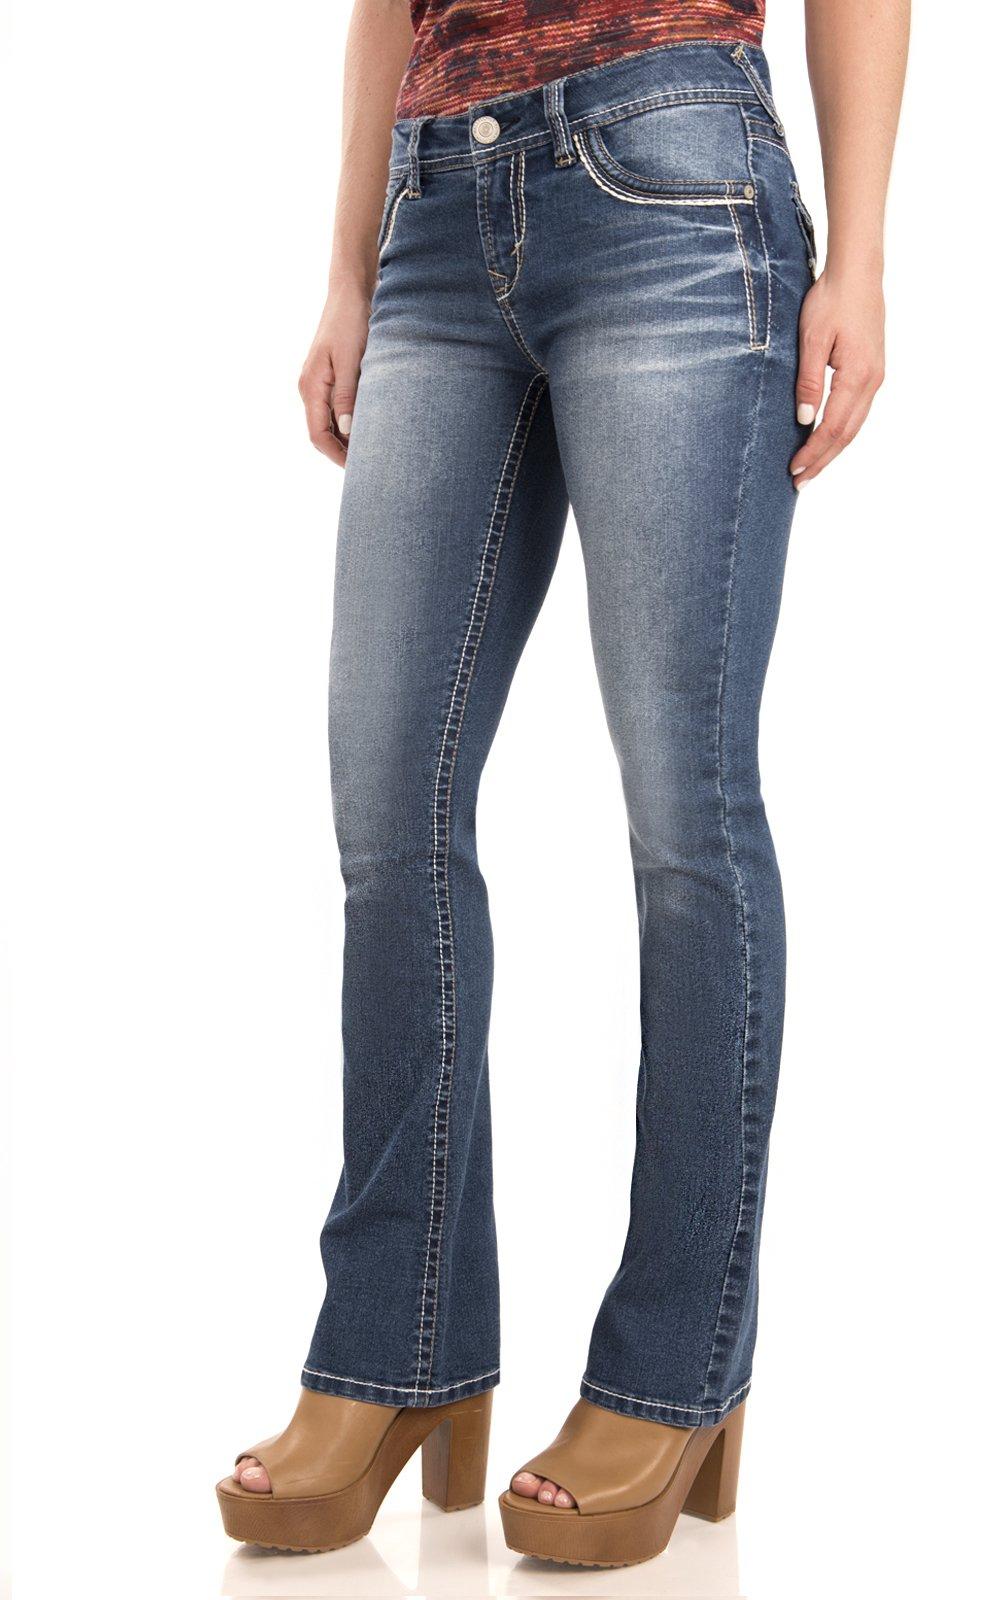 WallFlower Women's Juniors Classic Legendary Stretch Bootcut Denim Jeans w/Back Flap Pocket